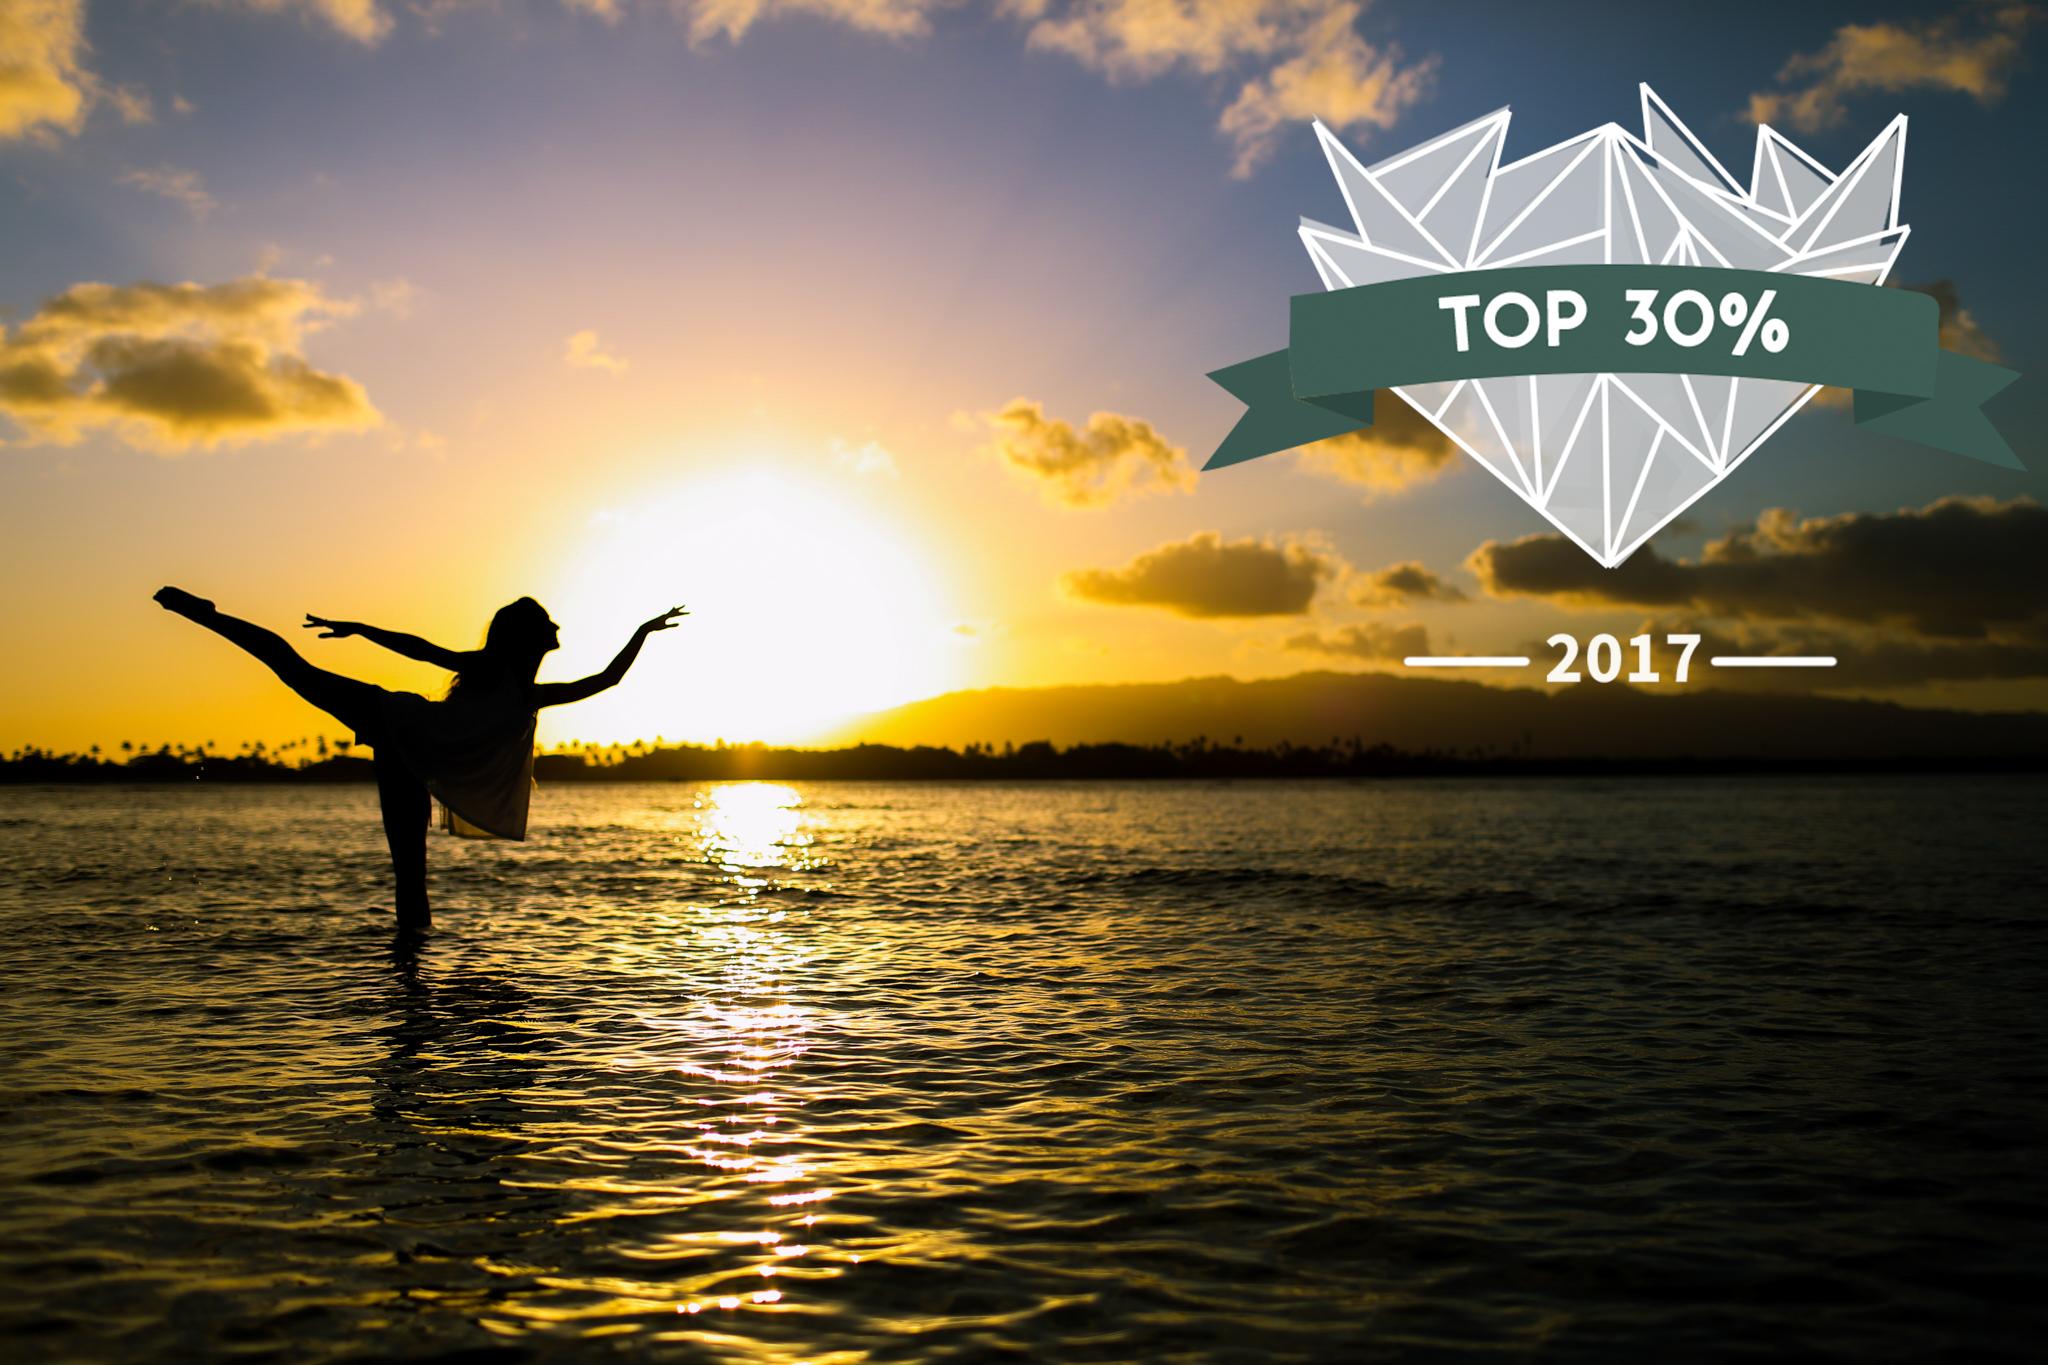 non watermarked 2017 shoot and share photo awards aloha sunshine photography 21May 20, 2016.jpg